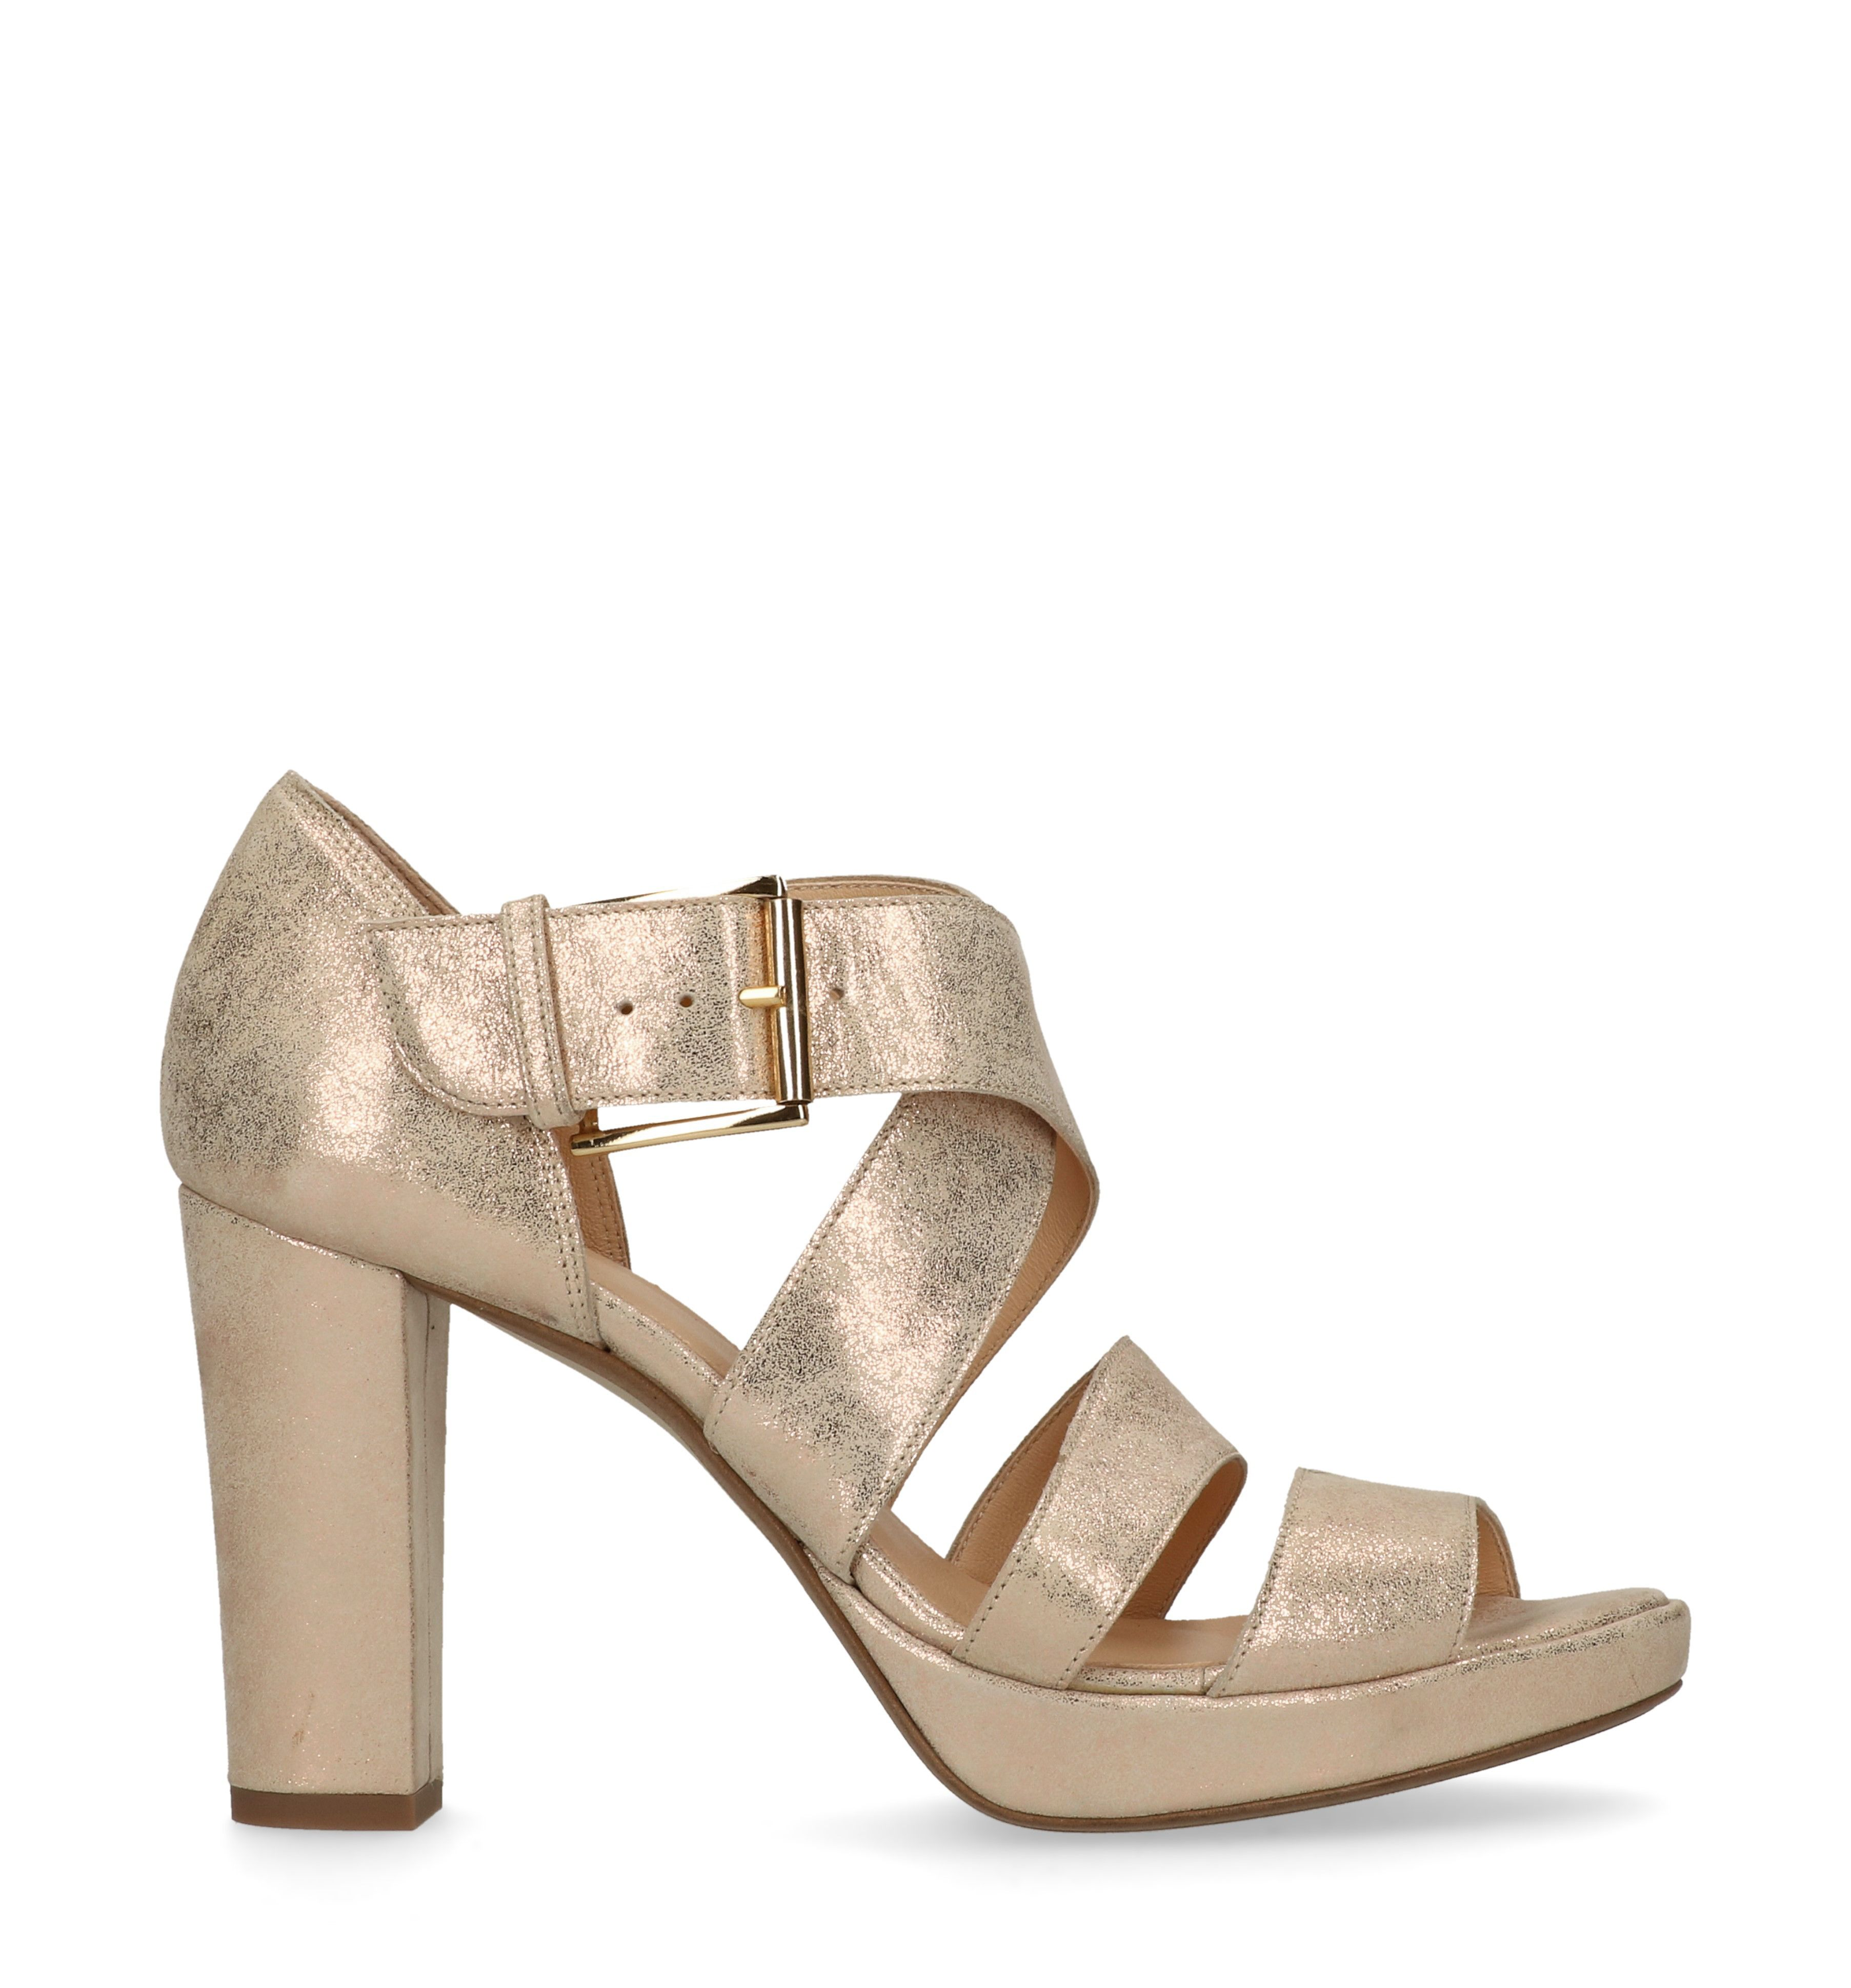 Sandalen Sandalen Met DamesManfield Sandalen Gouden Met Hak Hak DamesManfield Hak Gouden Gouden Met J5FK1lcuT3